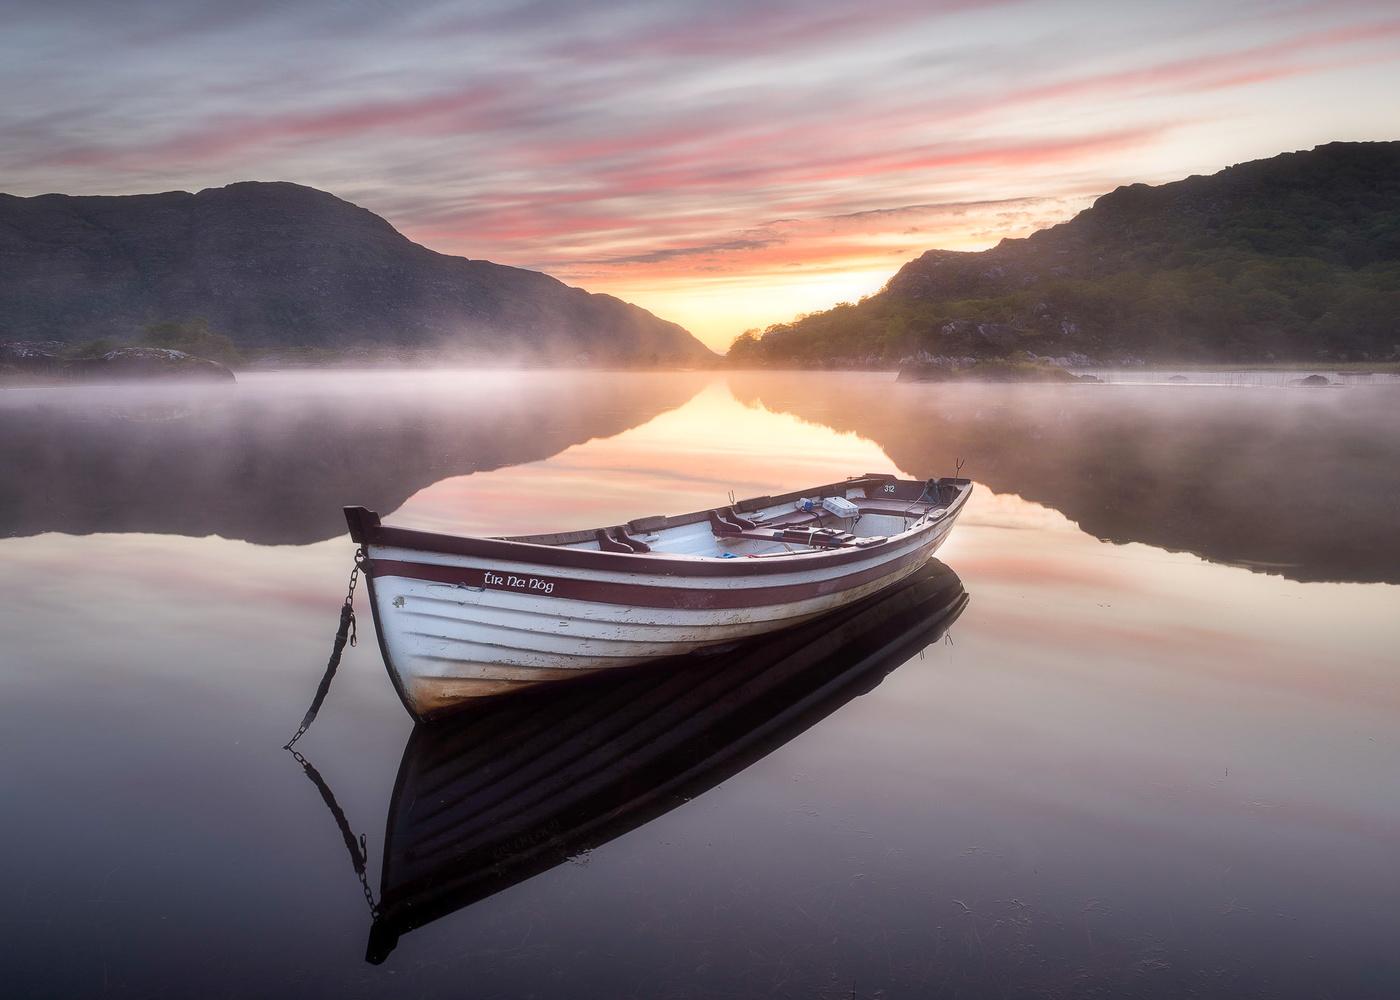 Upper Lake Sunrise by Sean O' Riordan